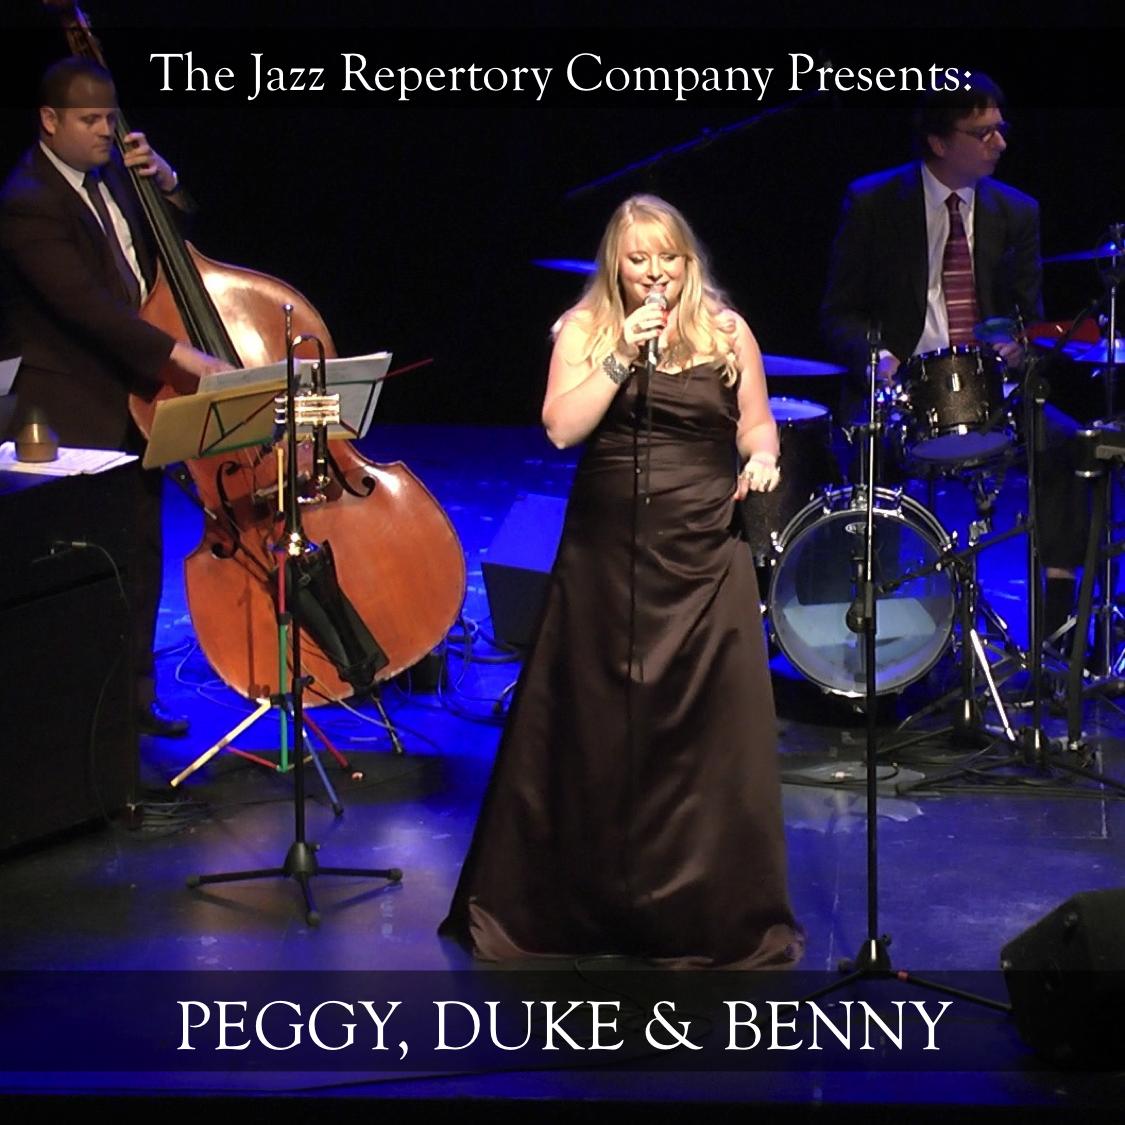 Peggy, Duke & Benny